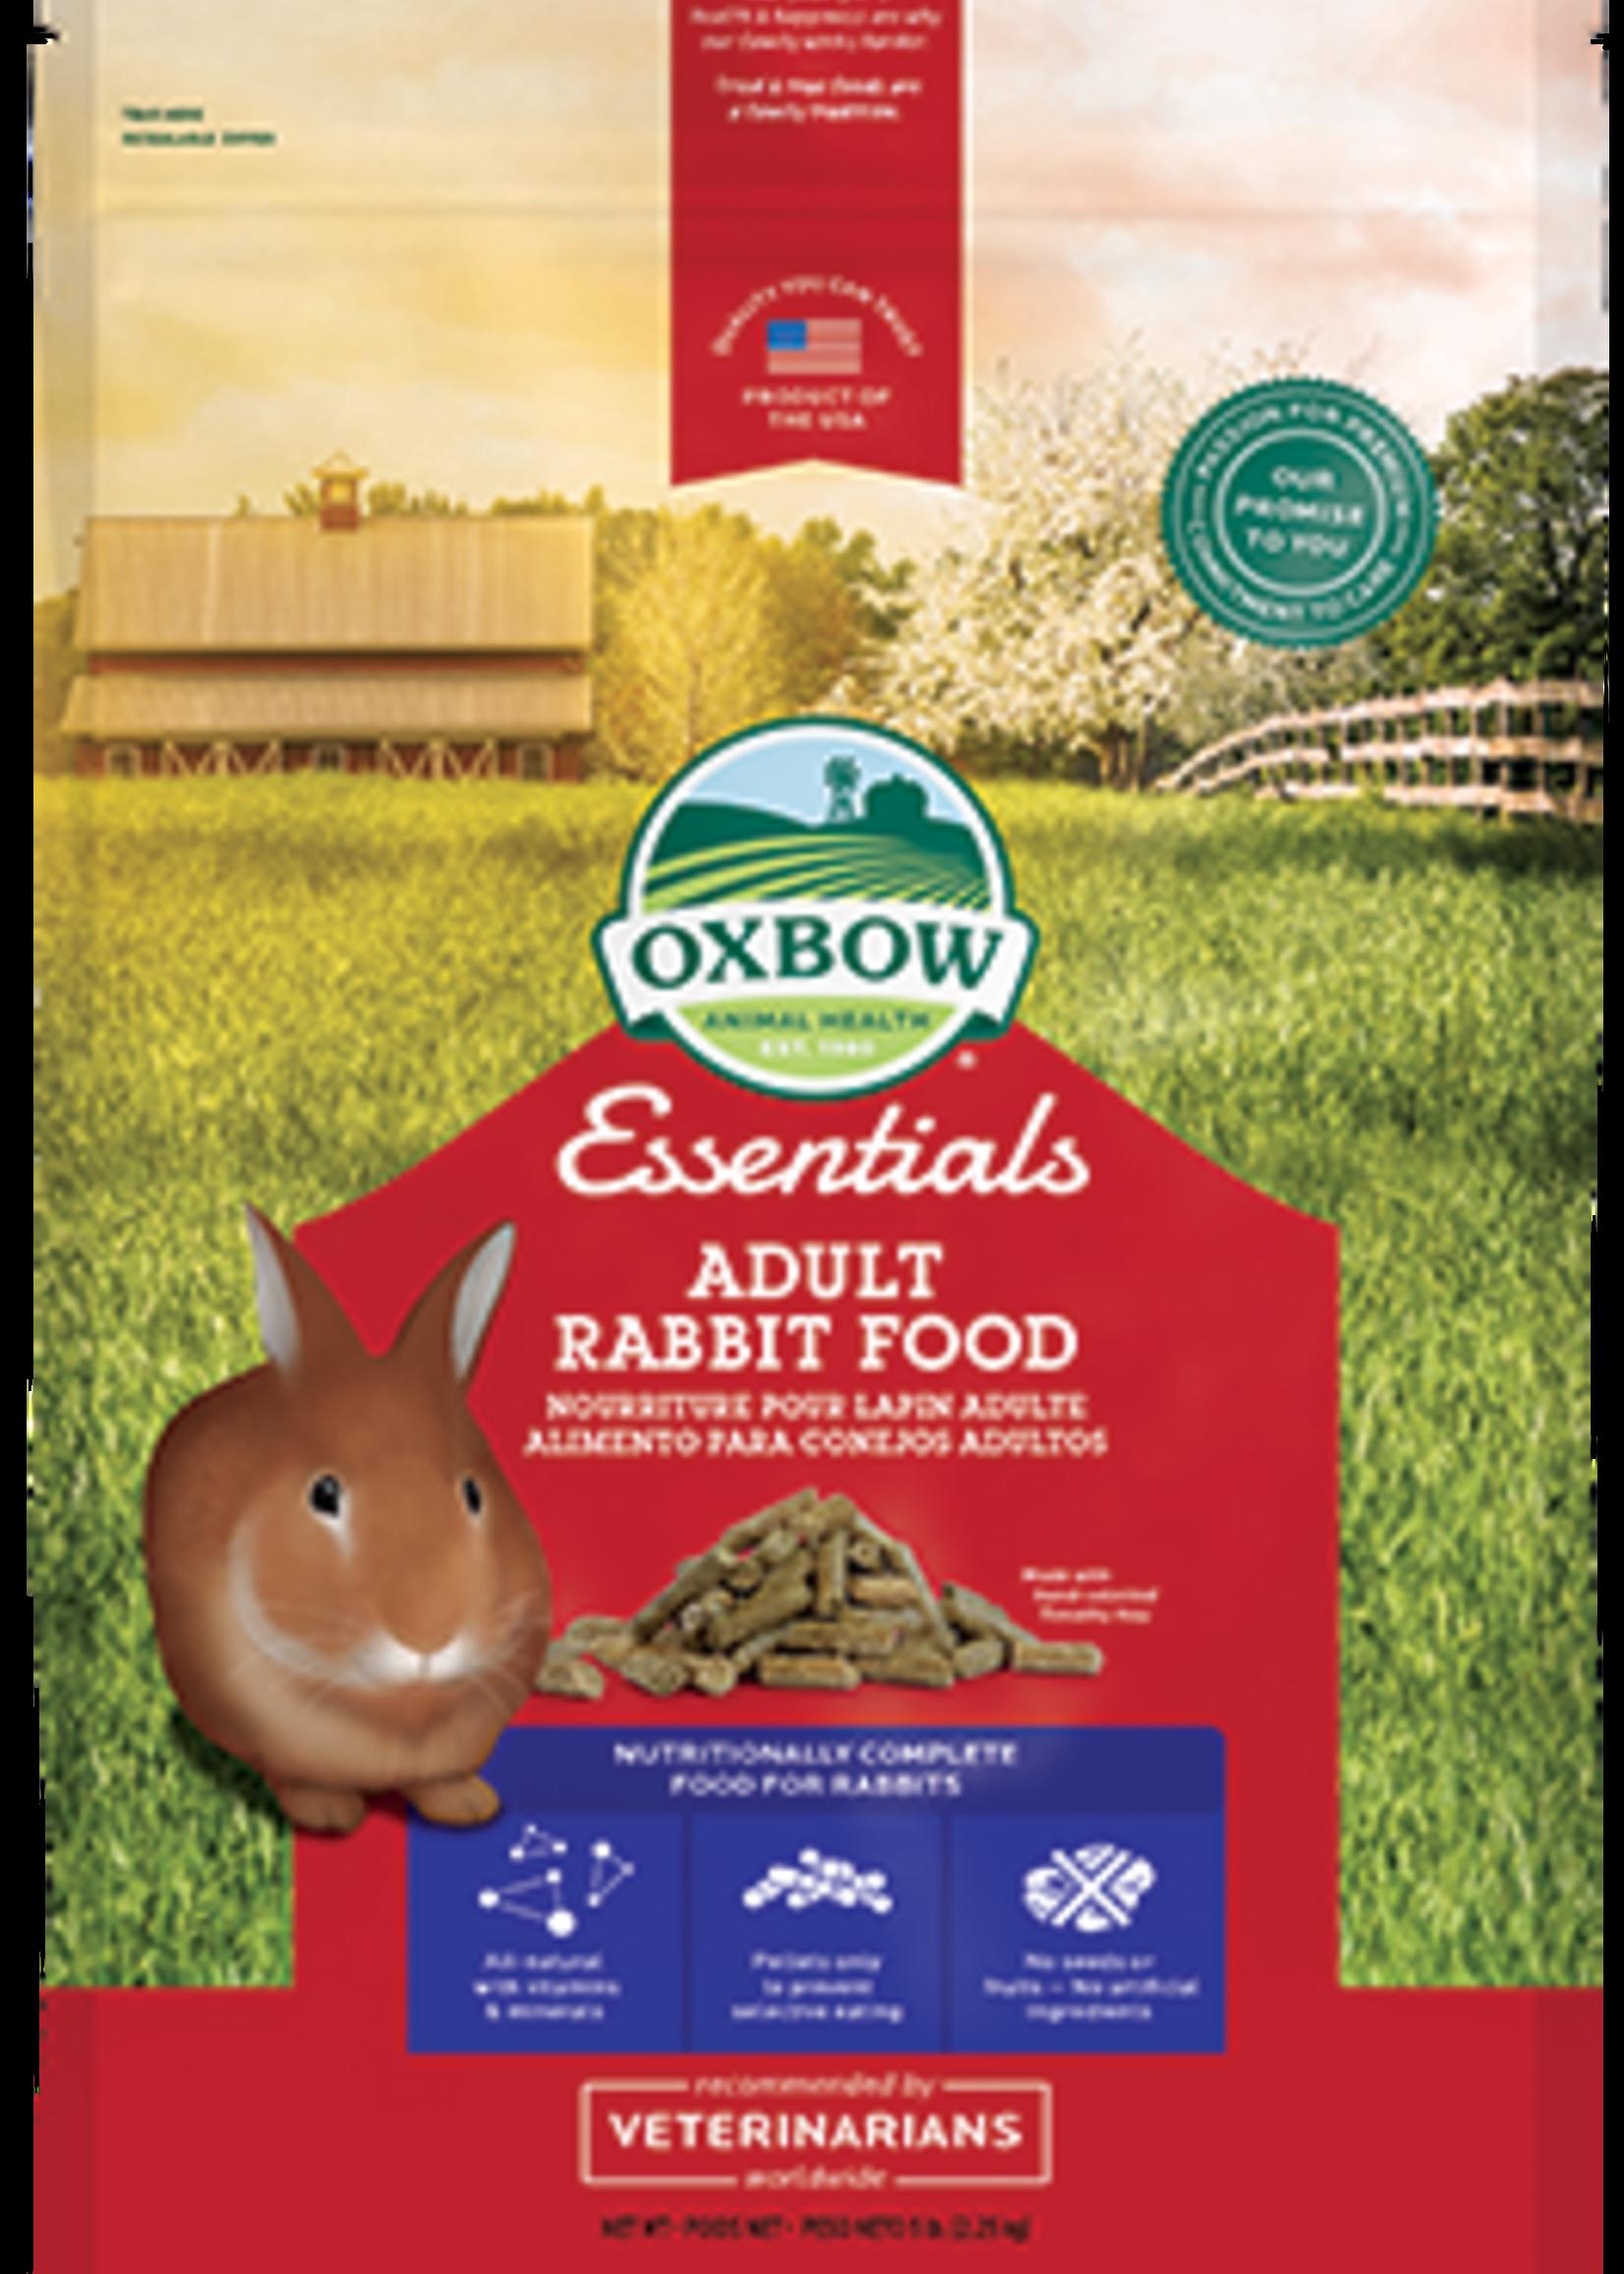 Oxbow Animal Health™ Oxbow Essentials Adult Rabbit Food 5lbs